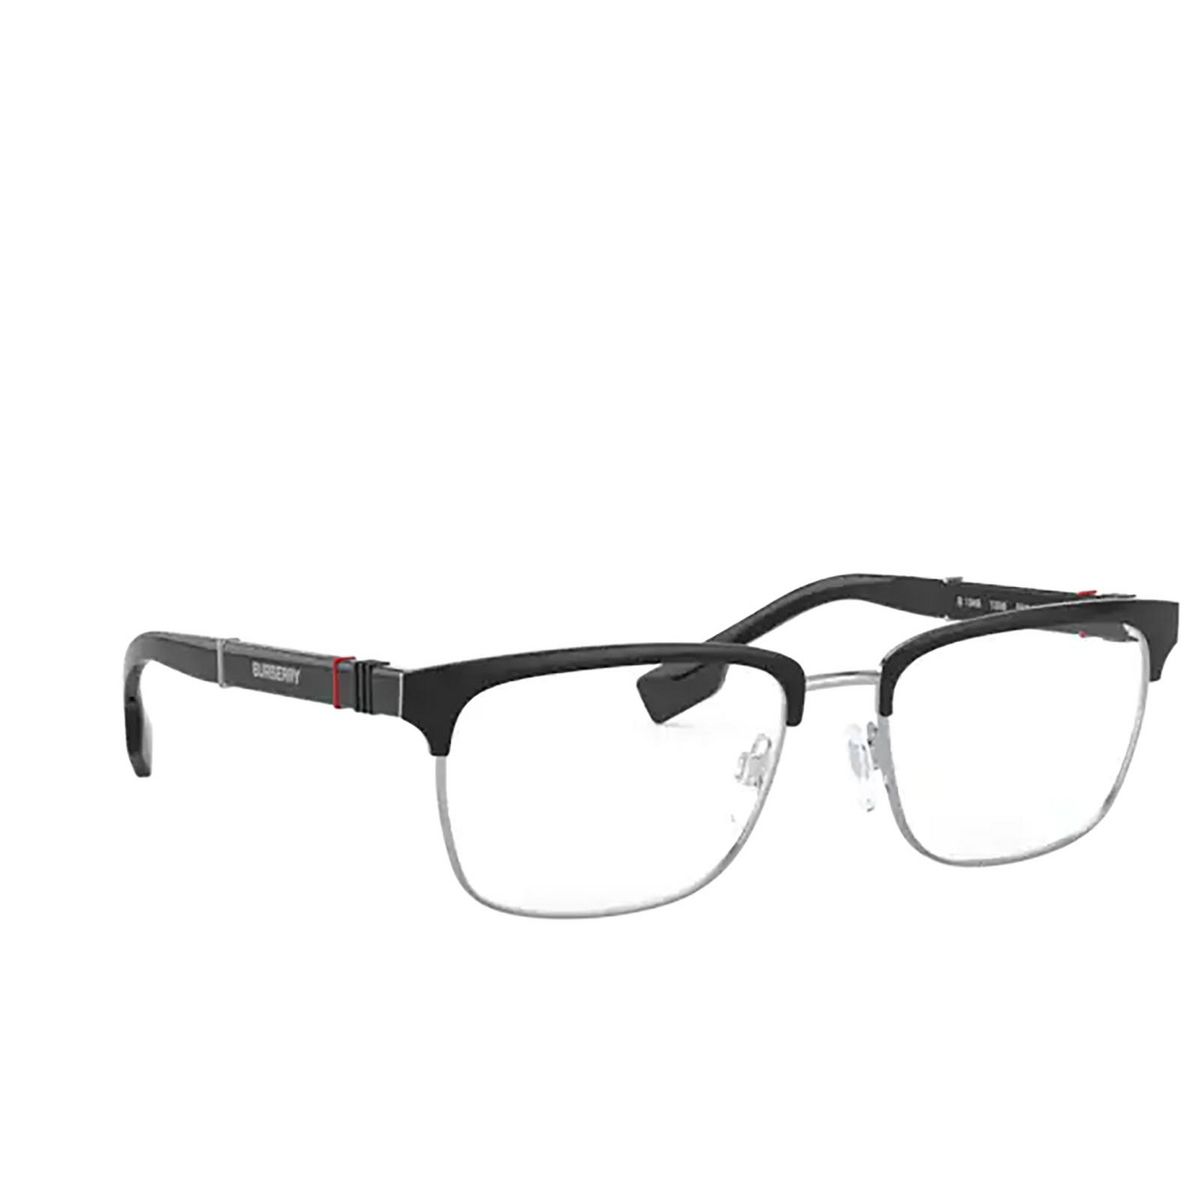 Burberry® Rectangle Eyeglasses: Alba BE1348 color Silver / Matte Black 1306 - three-quarters view.